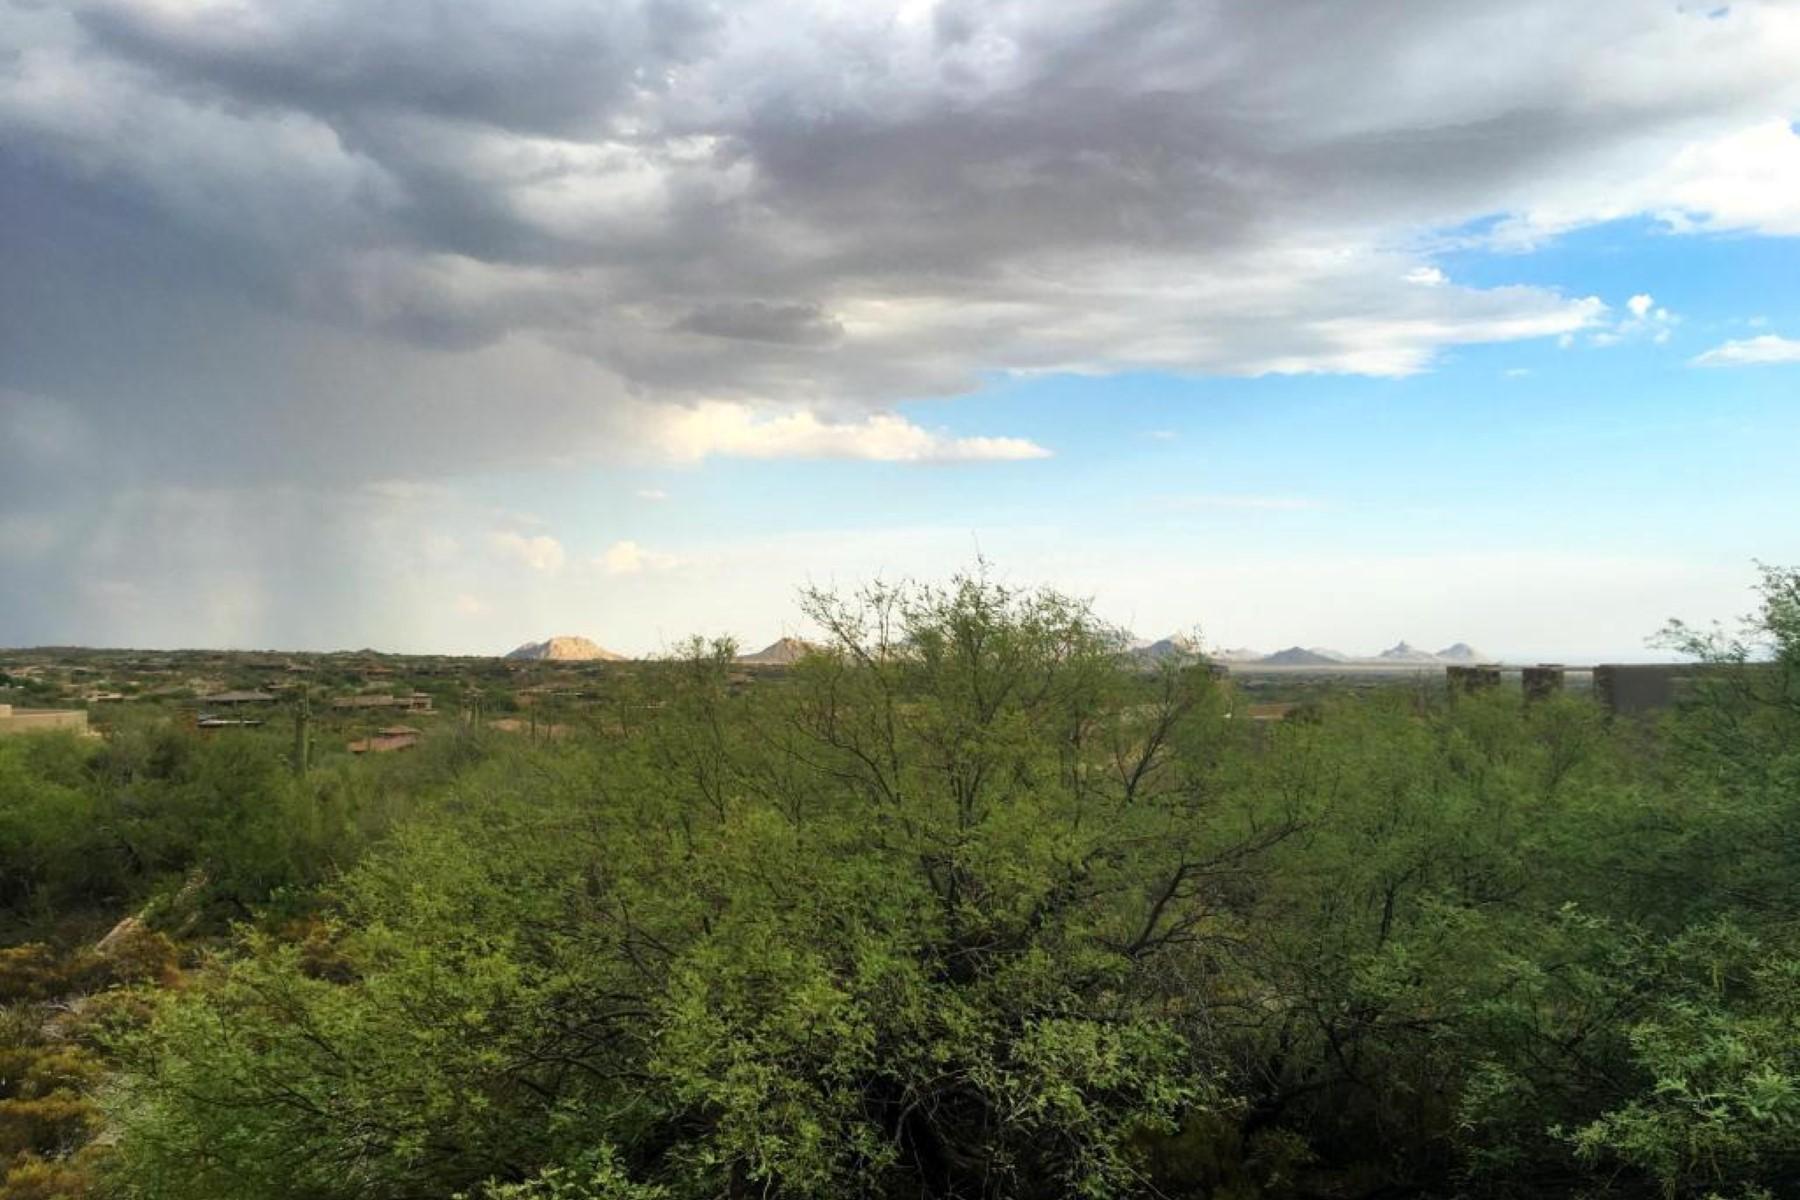 Земля для того Продажа на Non-membership homesite Located in Saguaro Forest 42061 N 103rd Way #21 Scottsdale, Аризона, 85262 Соединенные Штаты